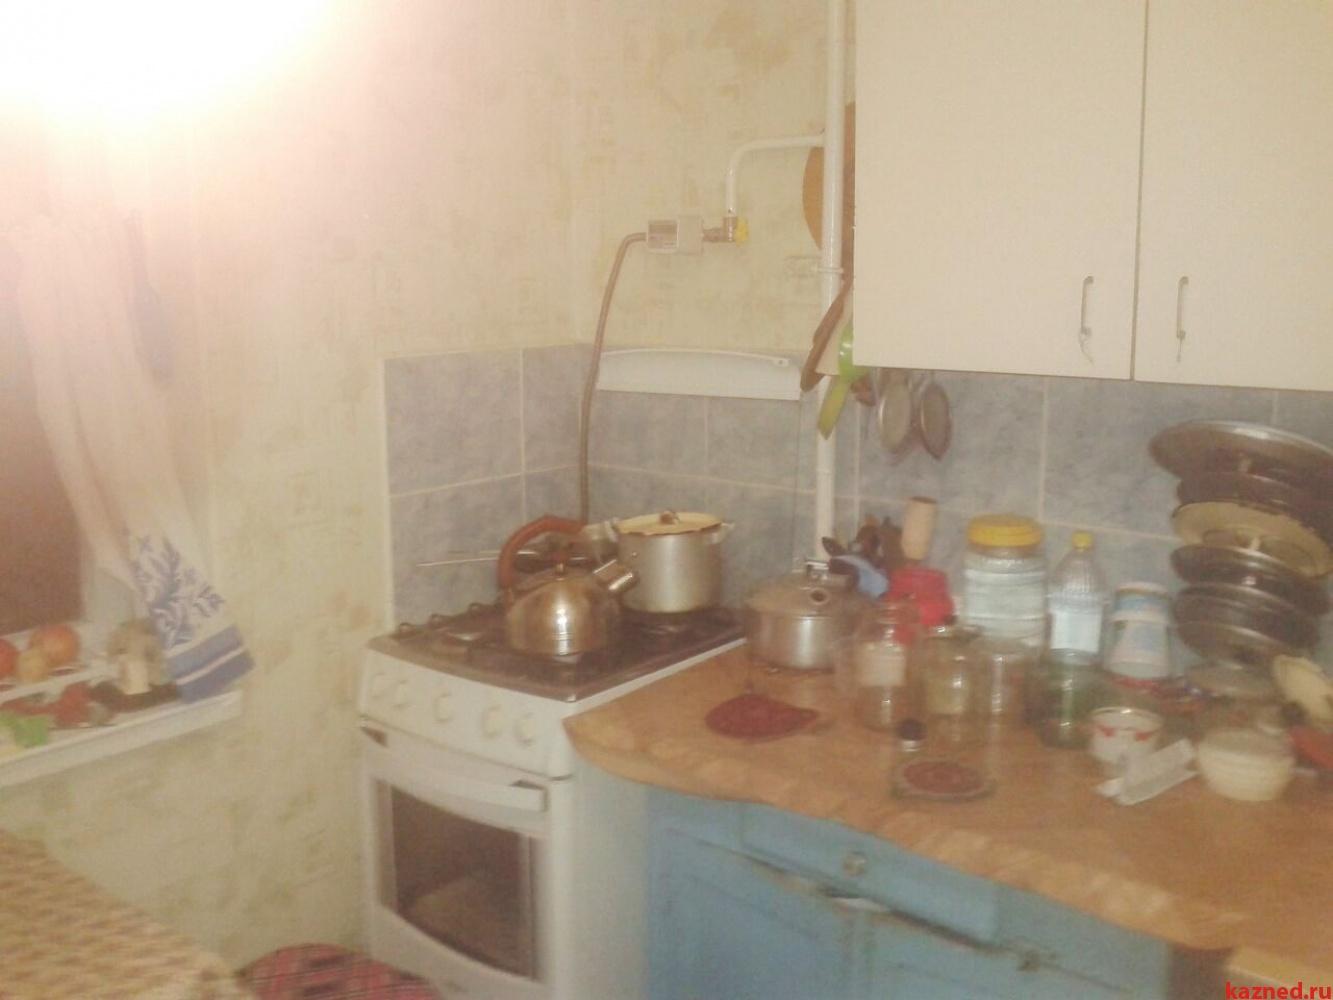 Продажа 1-к квартиры Фатыха Амирхана проспект, 91, 33 м² (миниатюра №3)